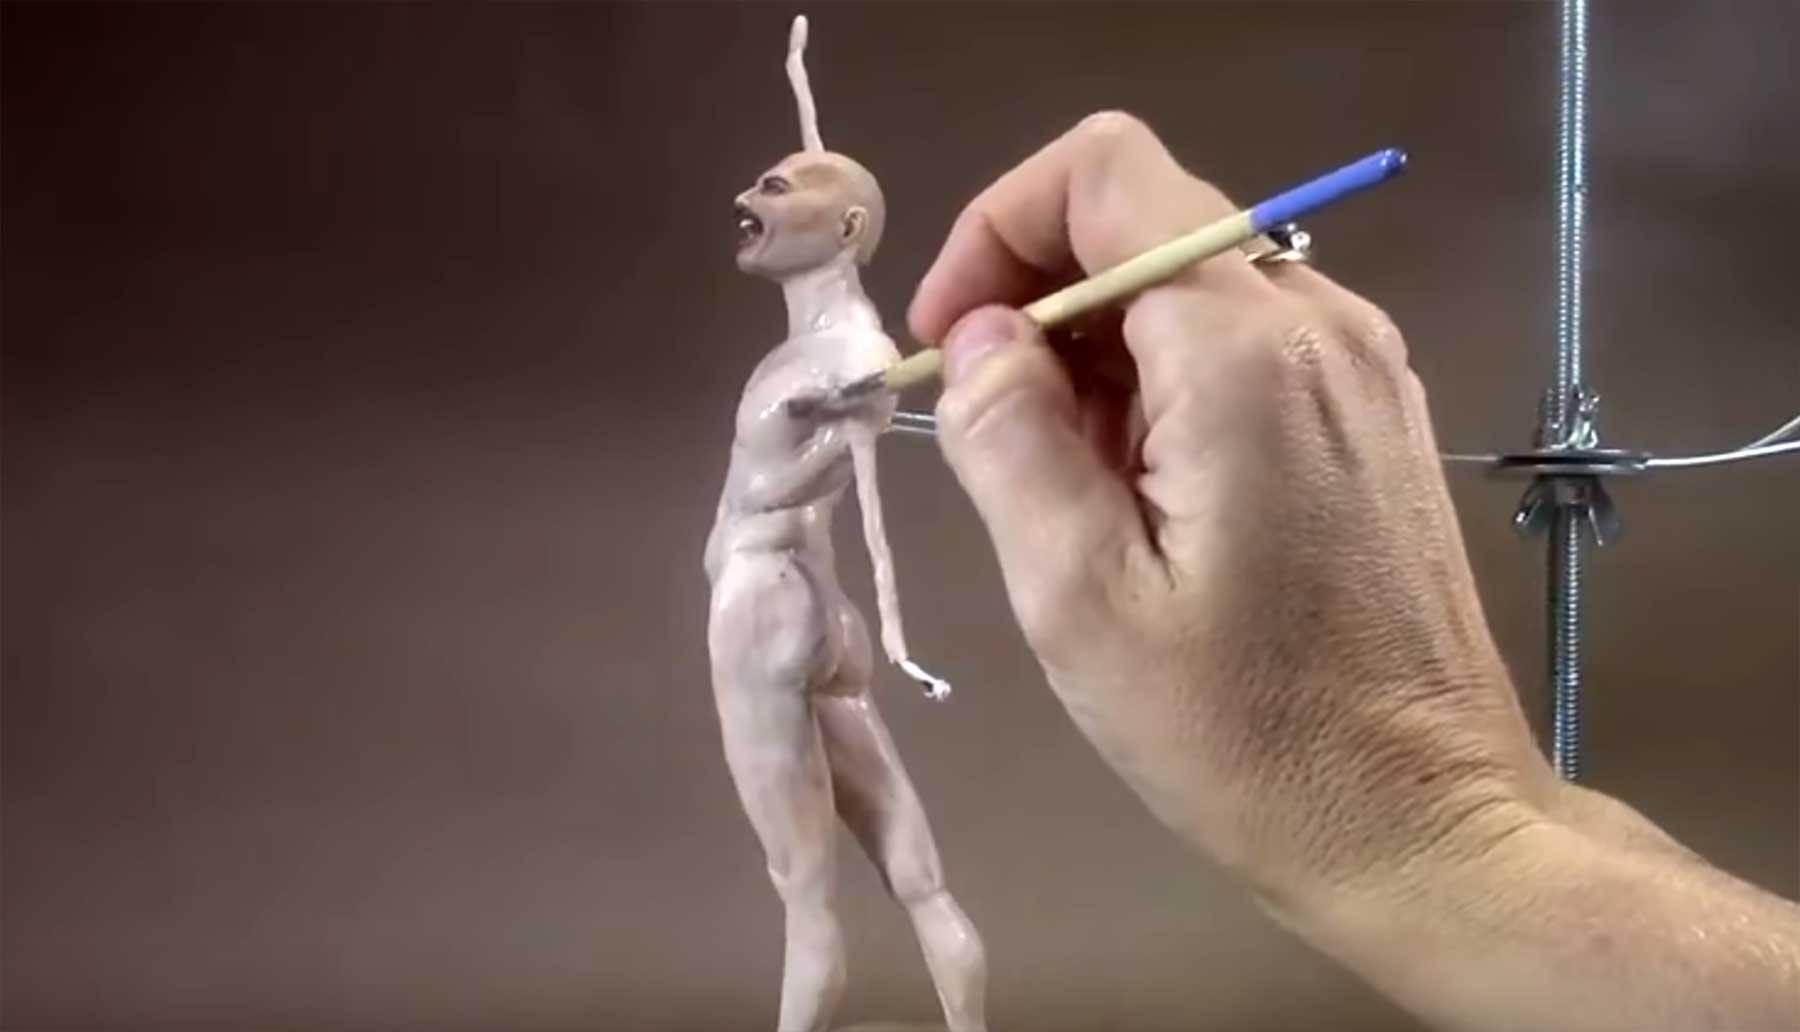 Die Entstehung eines Mini-Freddie Mercurys